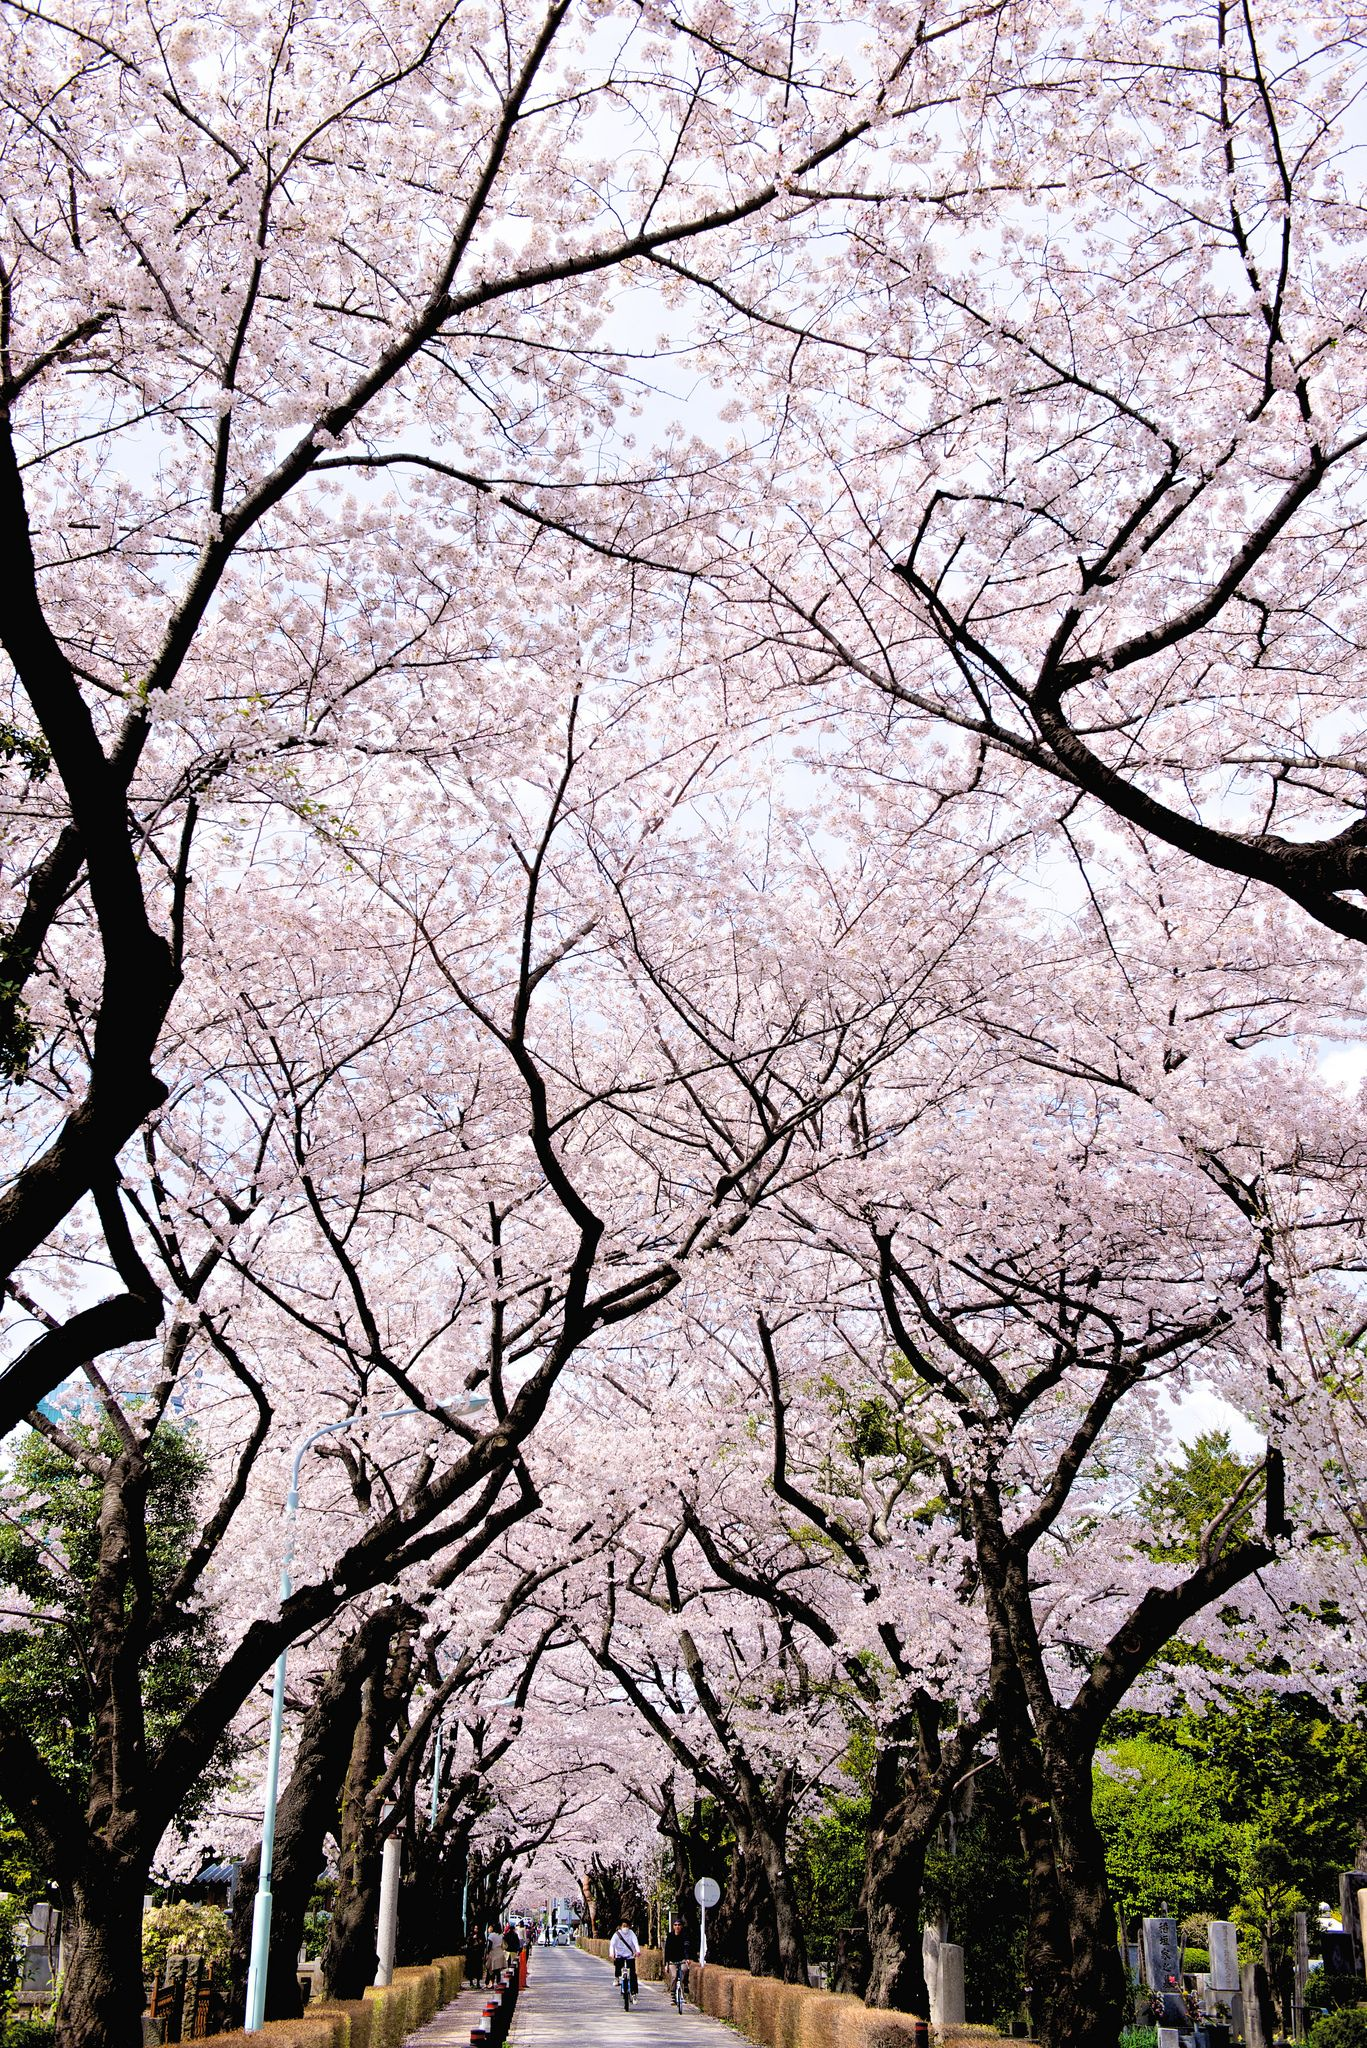 Ry1 9565 Sakura Cherry Blossom Cherry Blossom Japan Japanese Cherry